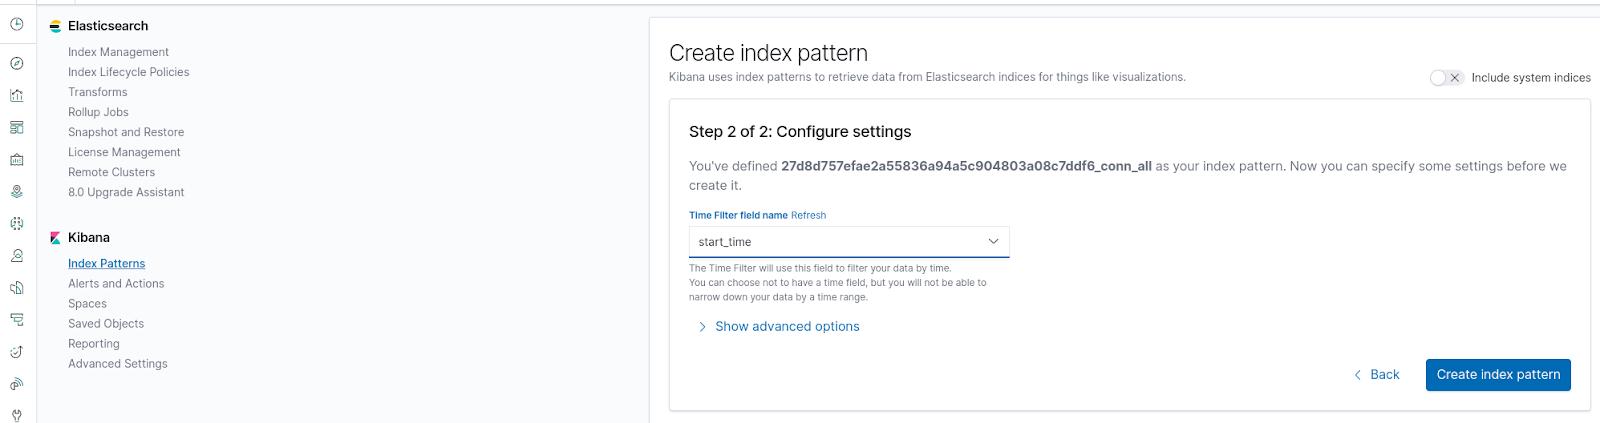 Create Index Pattern - Step2